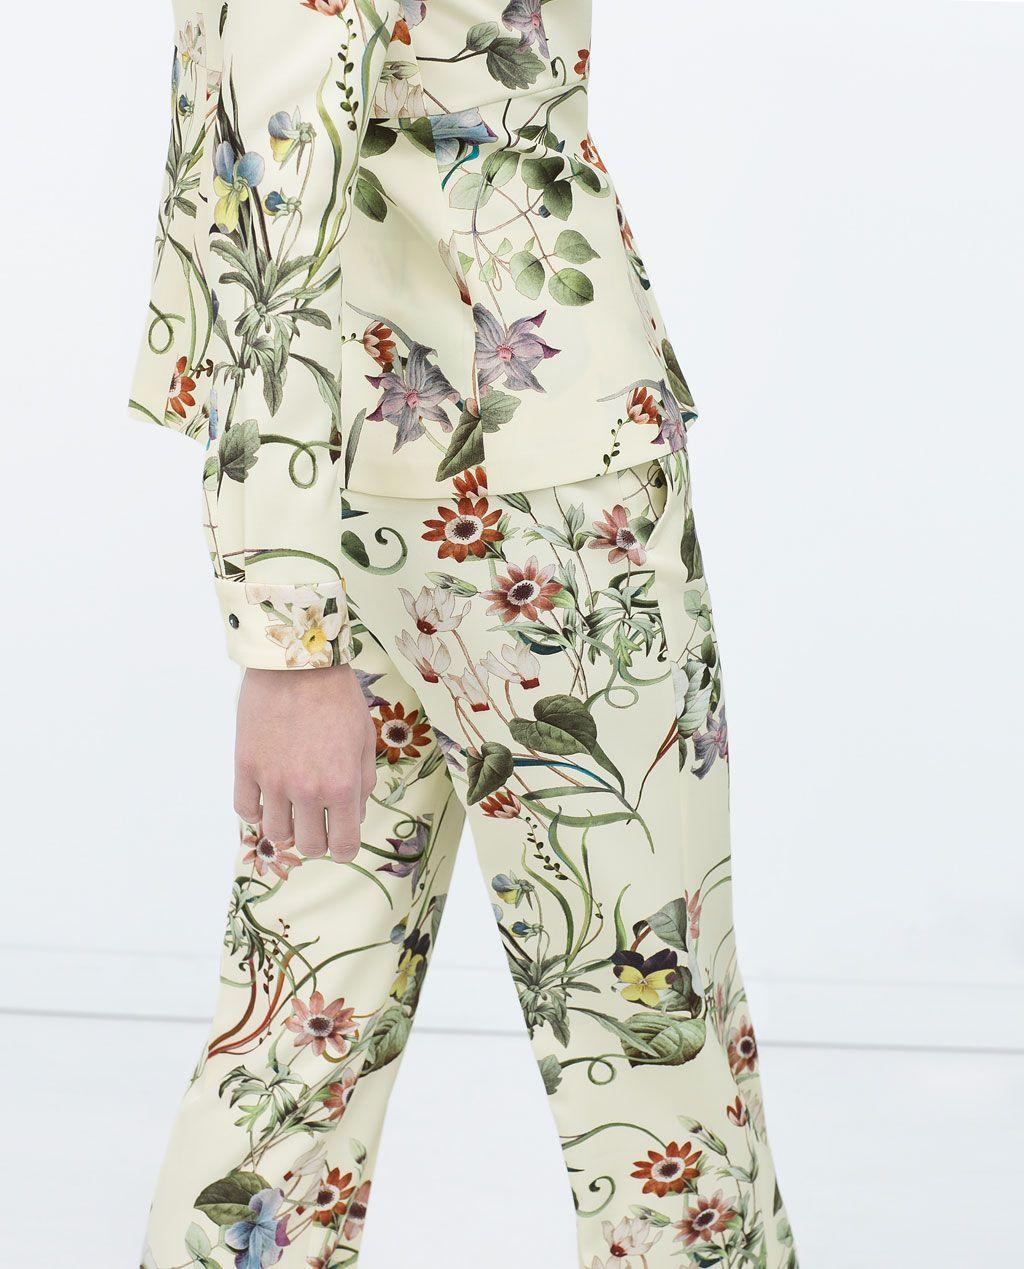 911c18c3b ZARA - WOMAN - FLORAL PRINT LOOSE TROUSERS   Pattern Play- Floral ...